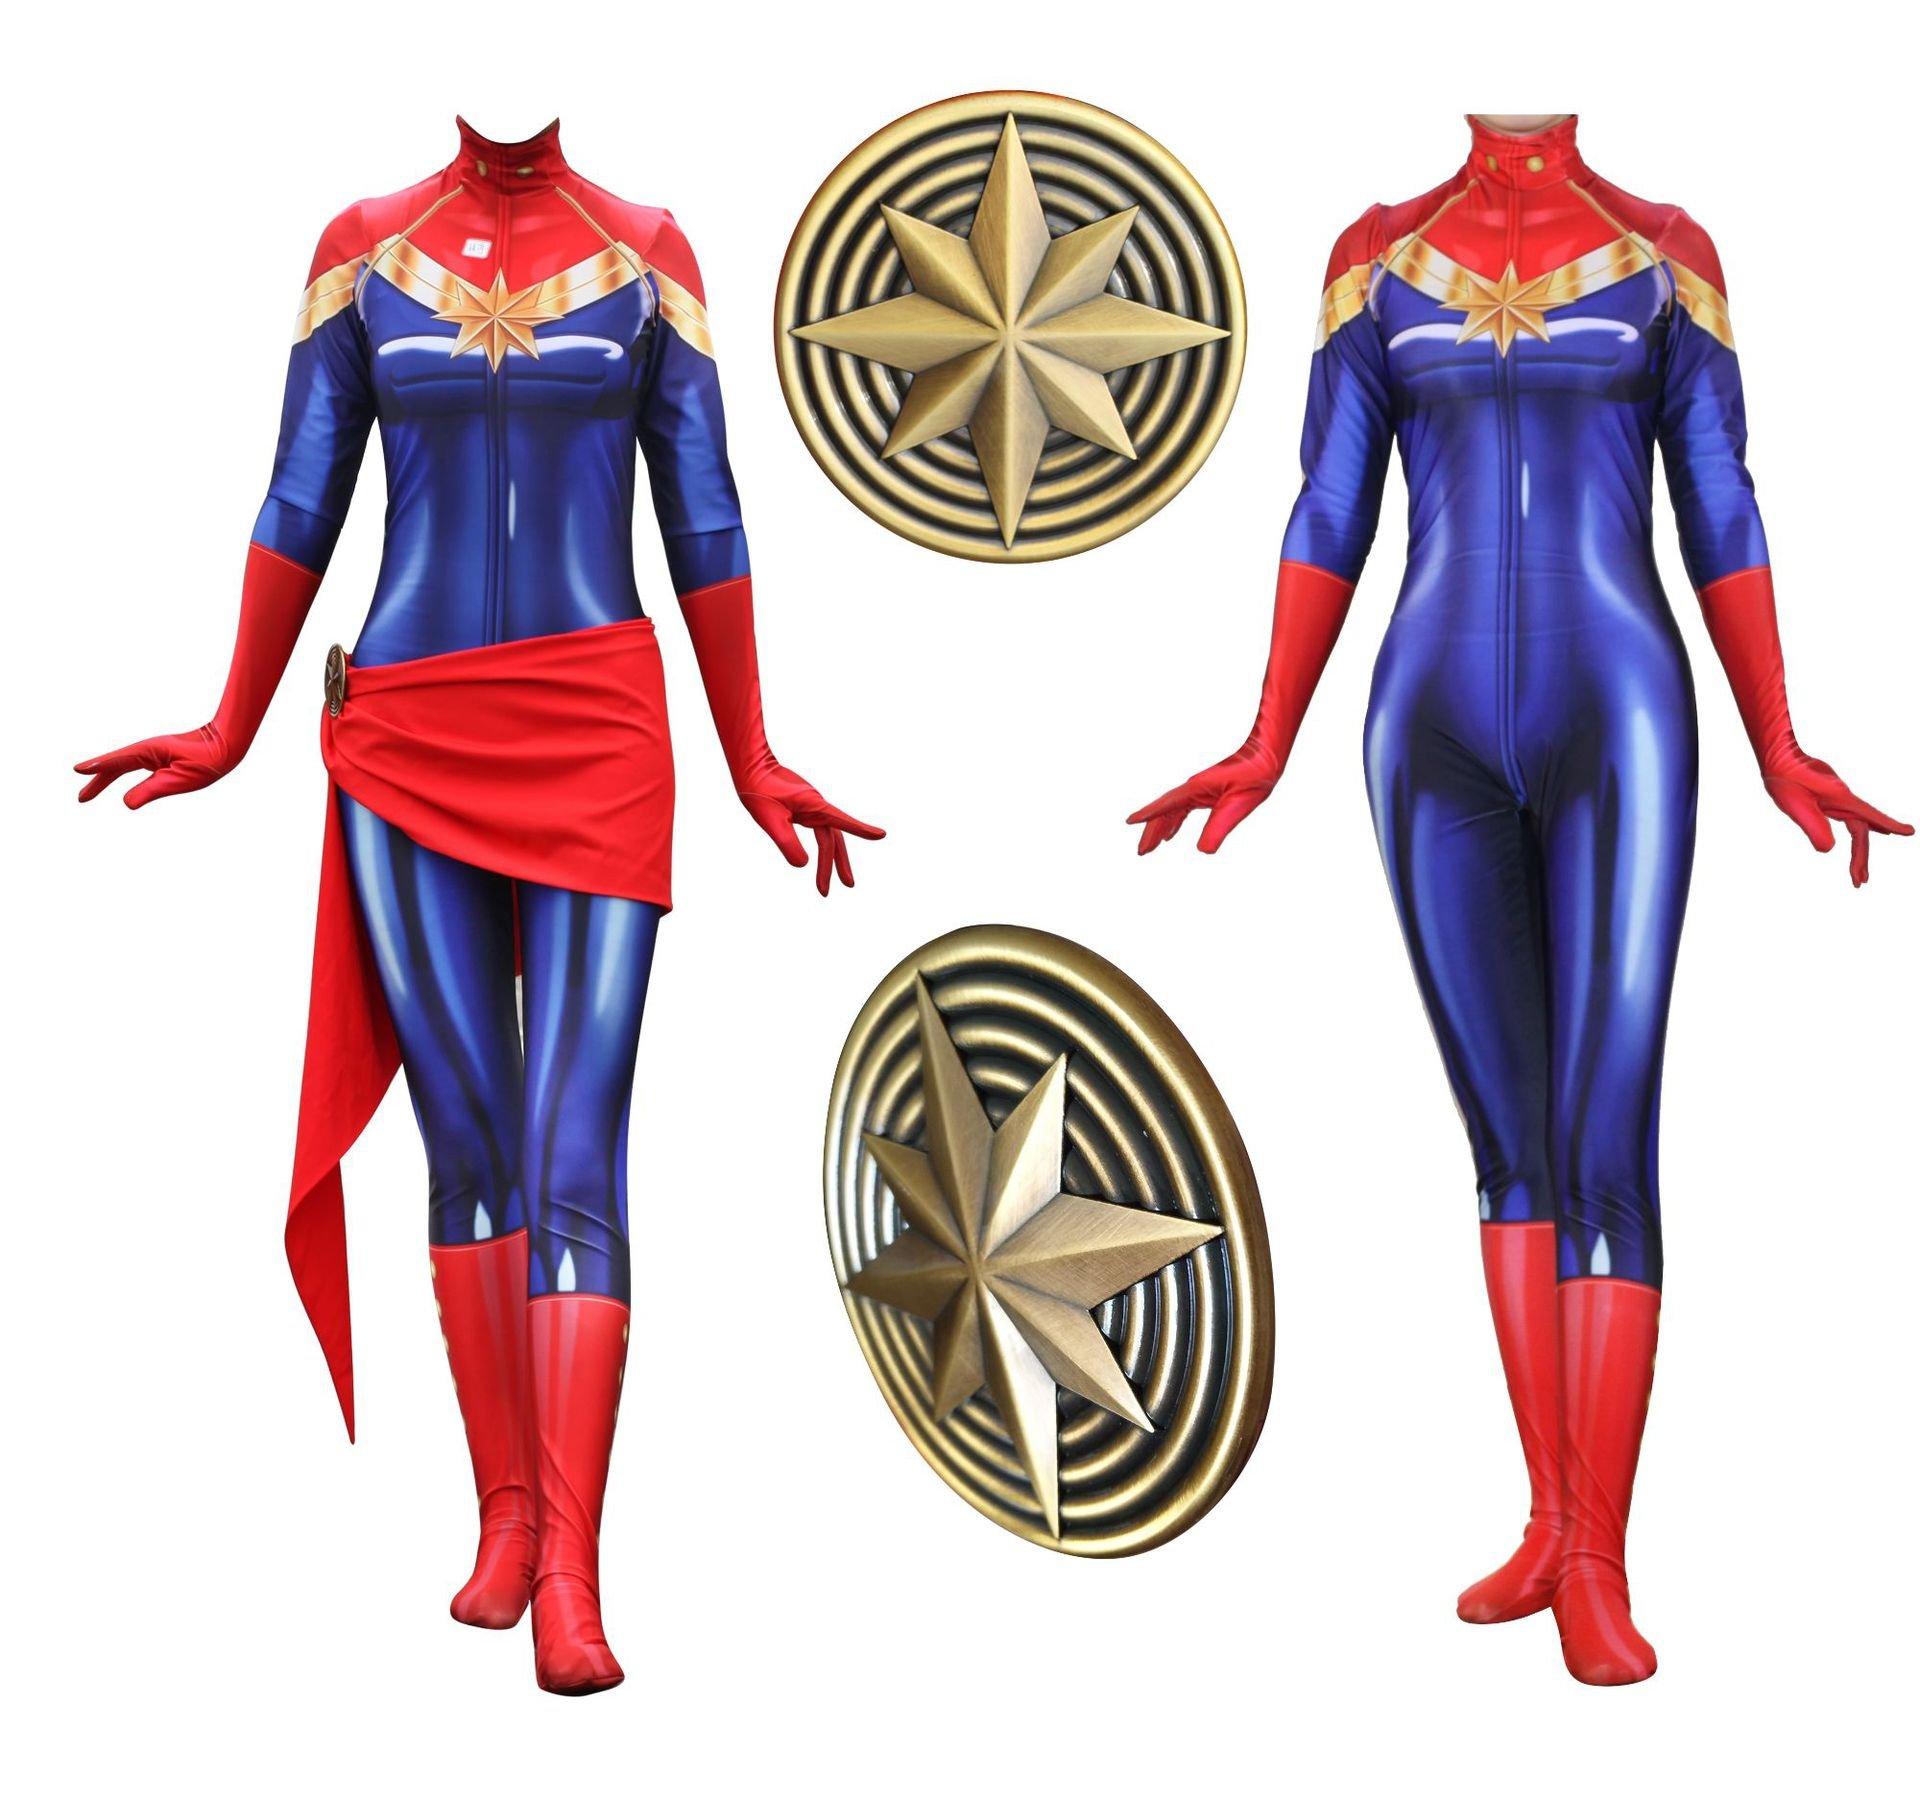 Lady Captain Suit Halloween Costume Spandex Bodysuit Zentai Cosplay Costume 81bXJN3xexL